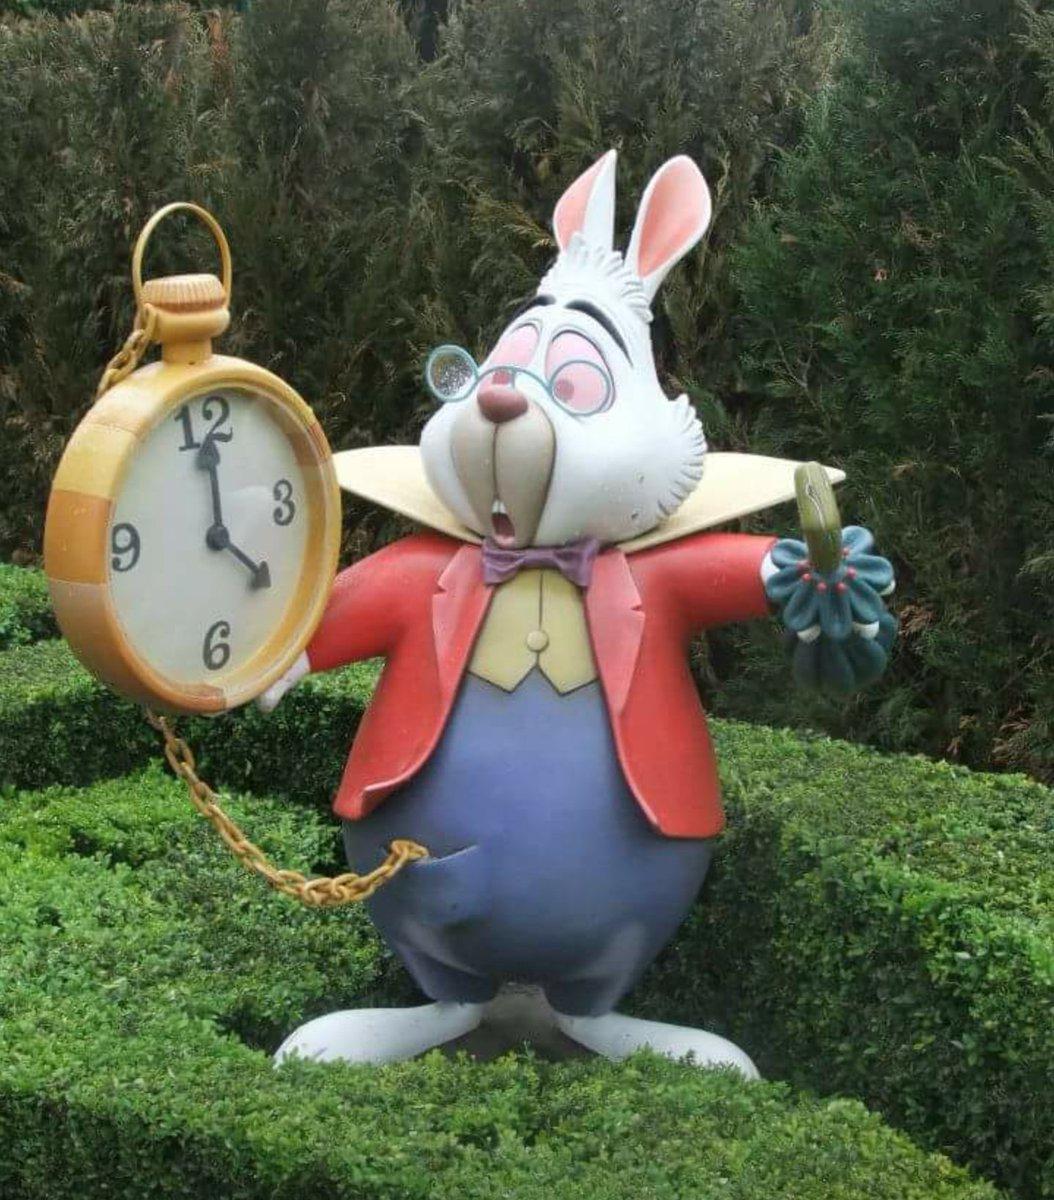 DisneylandParis, primark, thelionking, disney, disneylandparis, disnerd, whiterabbit, aliceinwonderland, disneylandparis, disnerd